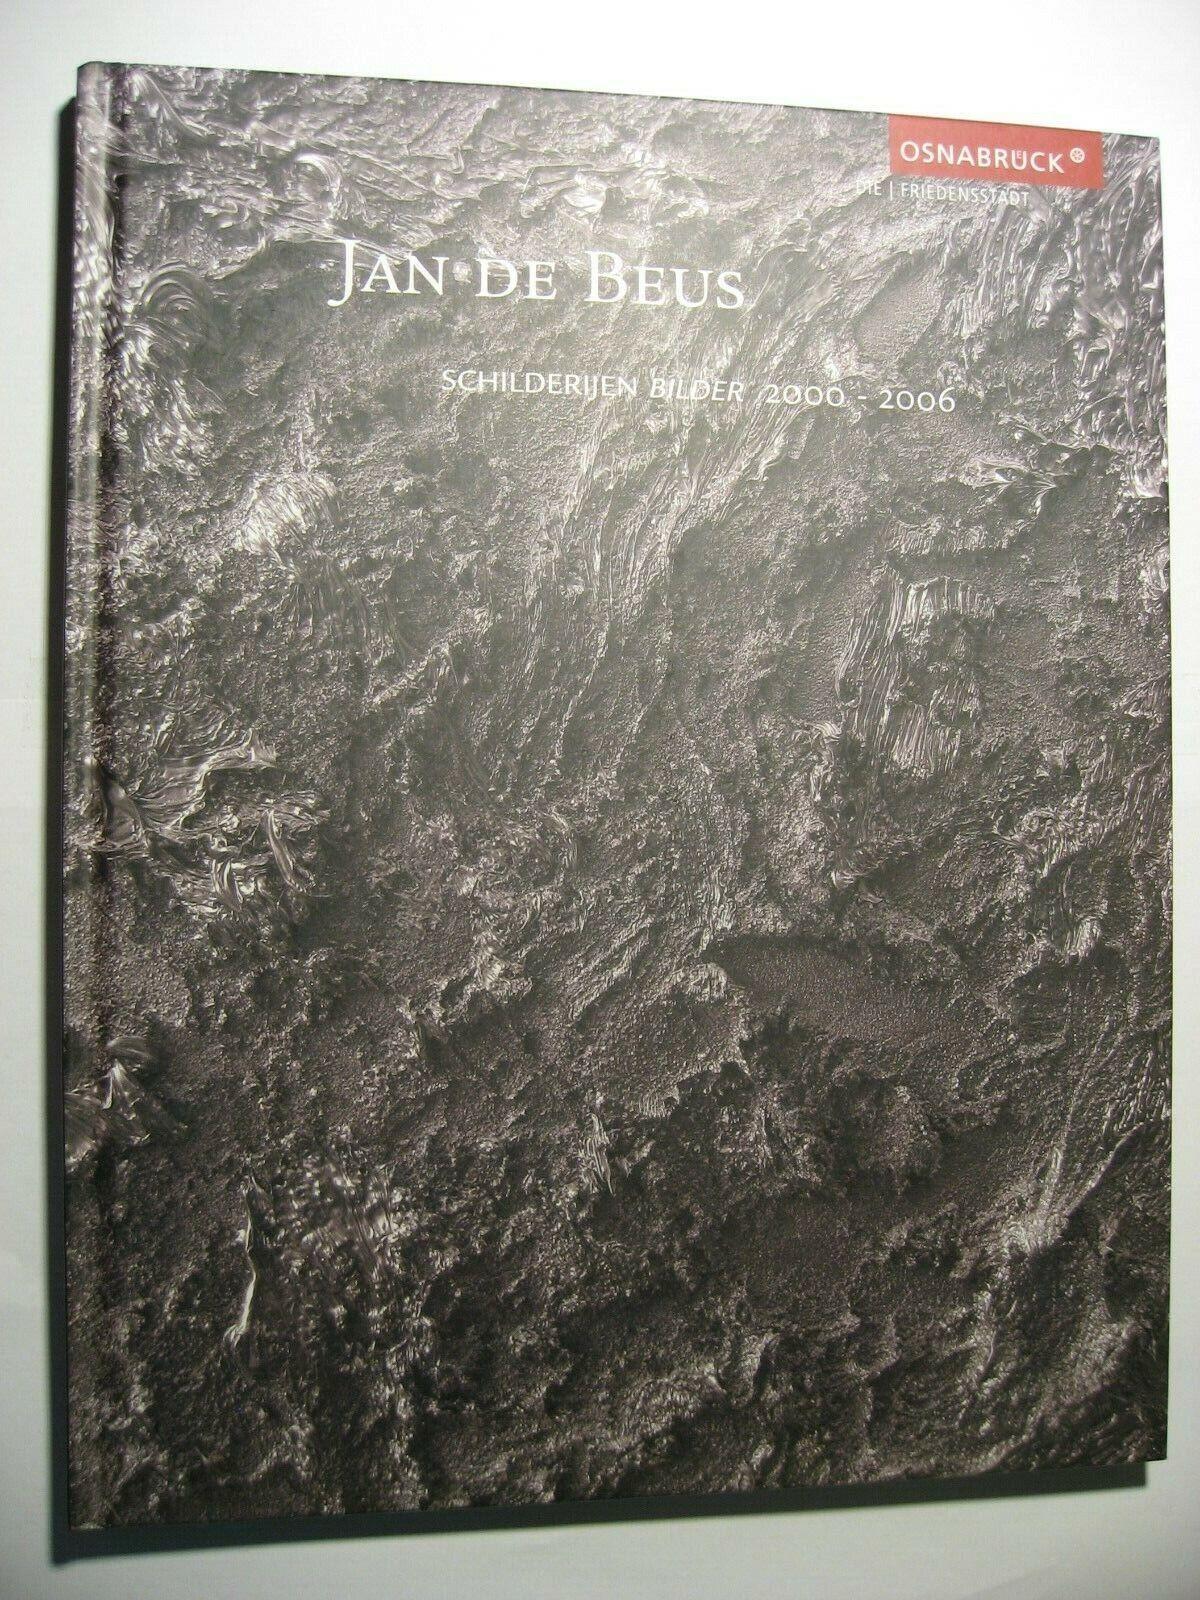 *Jan de Beus, Schilderijen Bilder 2000 - 2006, Osnabrück* - André Lindhorst